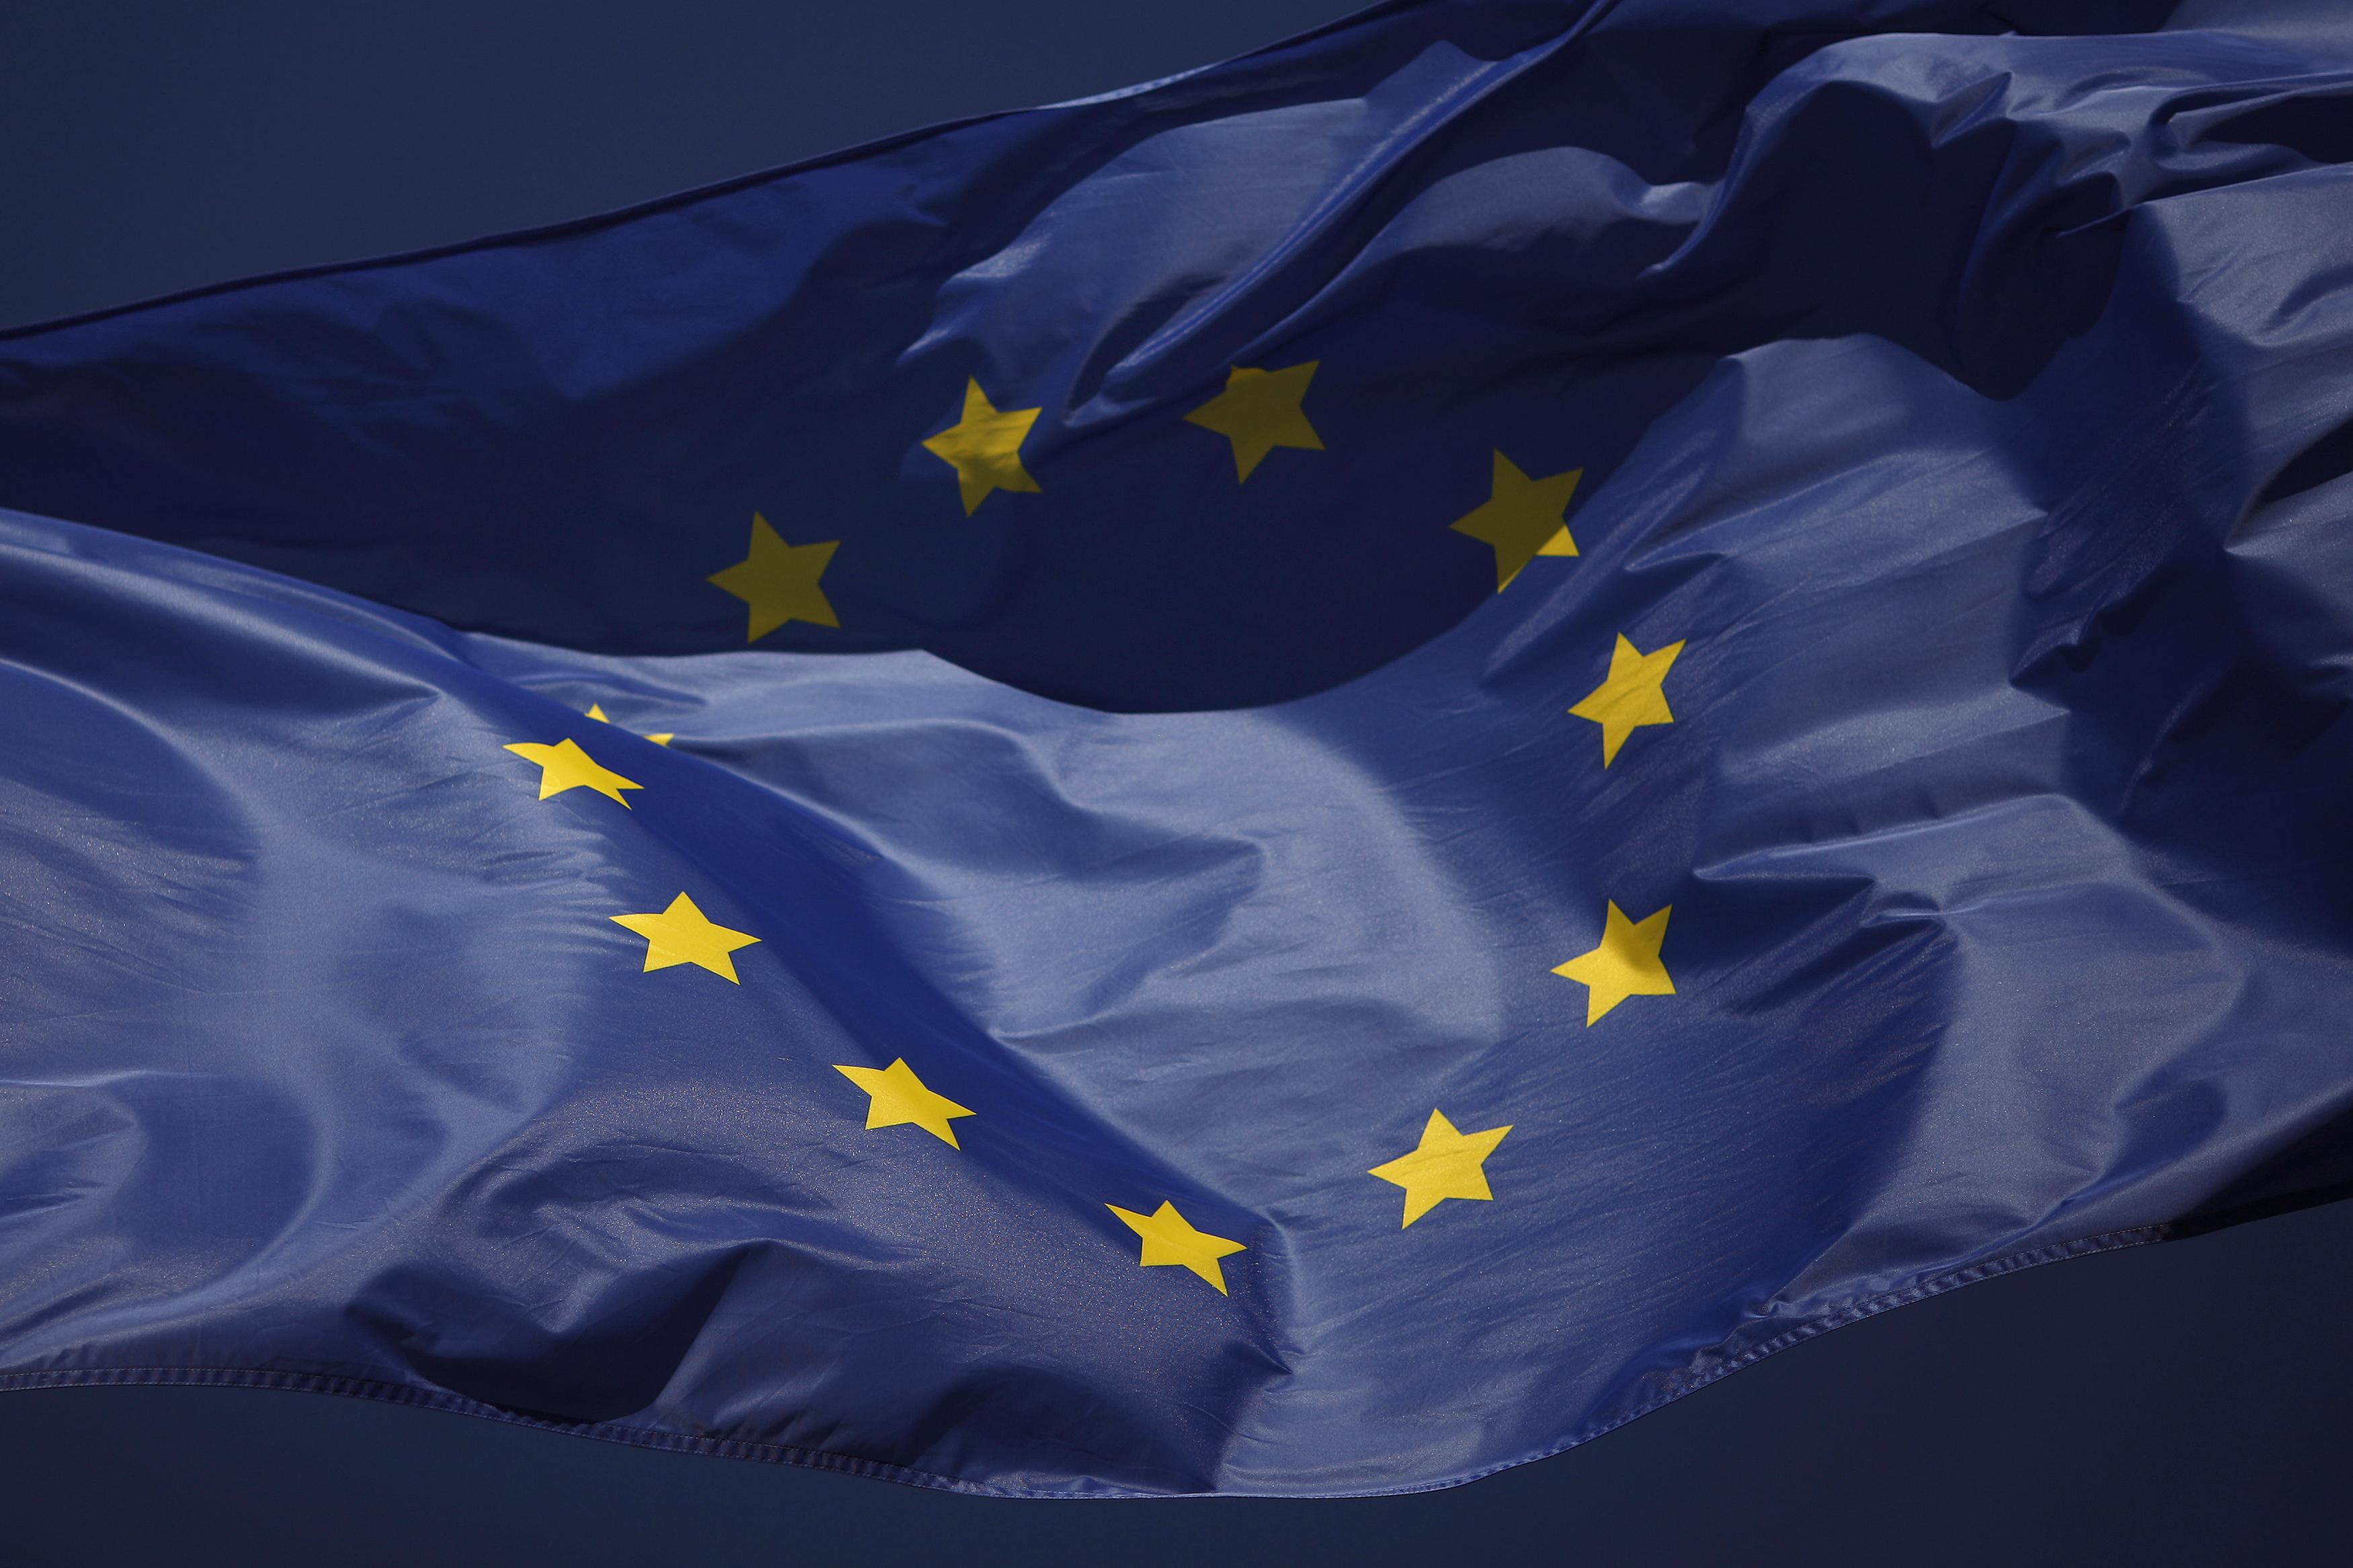 Image for Kus on Euroopa Liidu tasakaalupunkt?